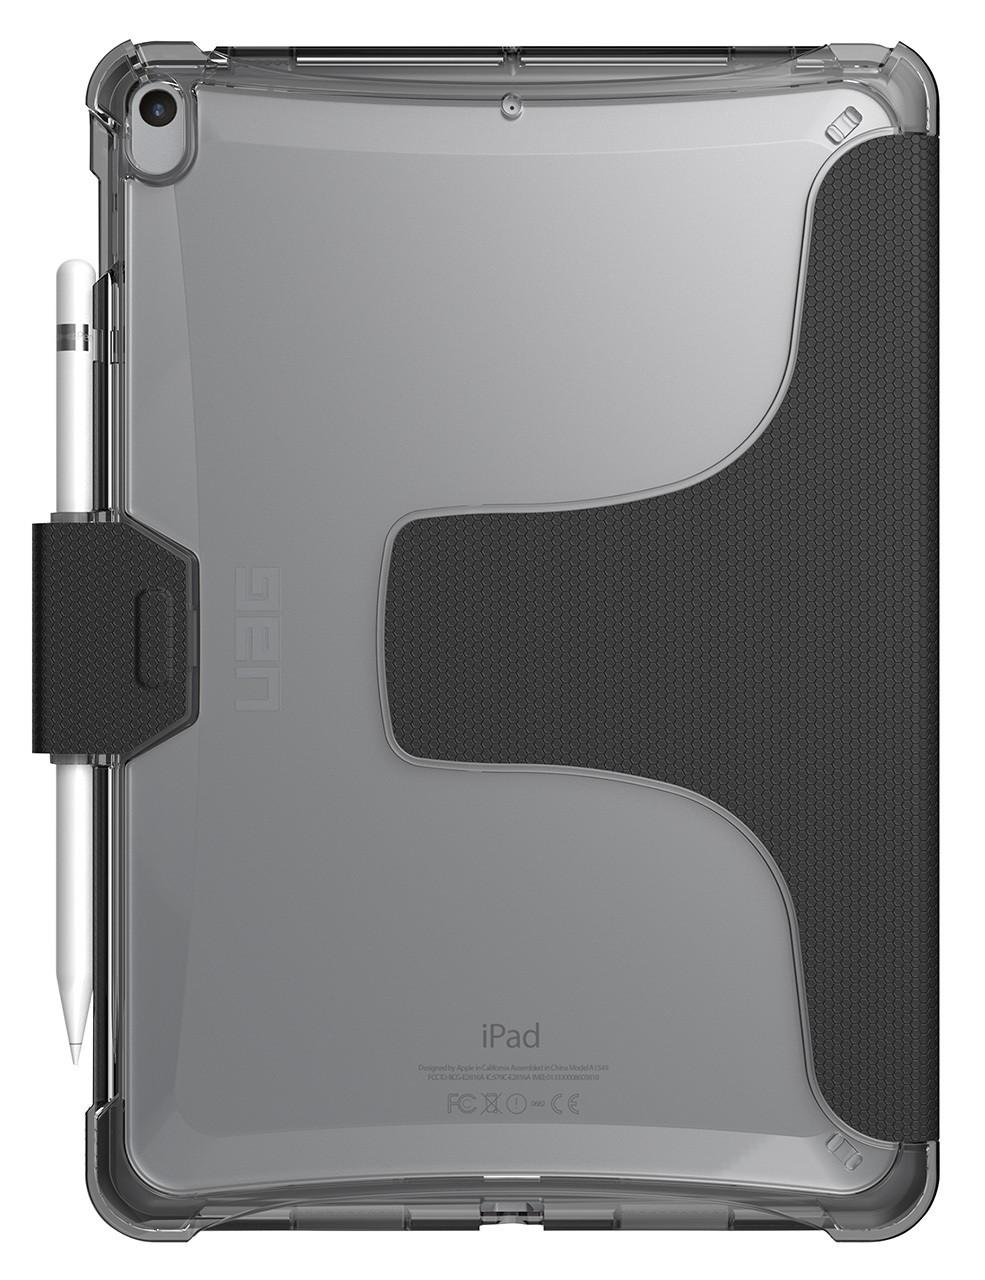 iPad Air(第3世代)やSurface Proを衝撃からスタイリッシュに保護